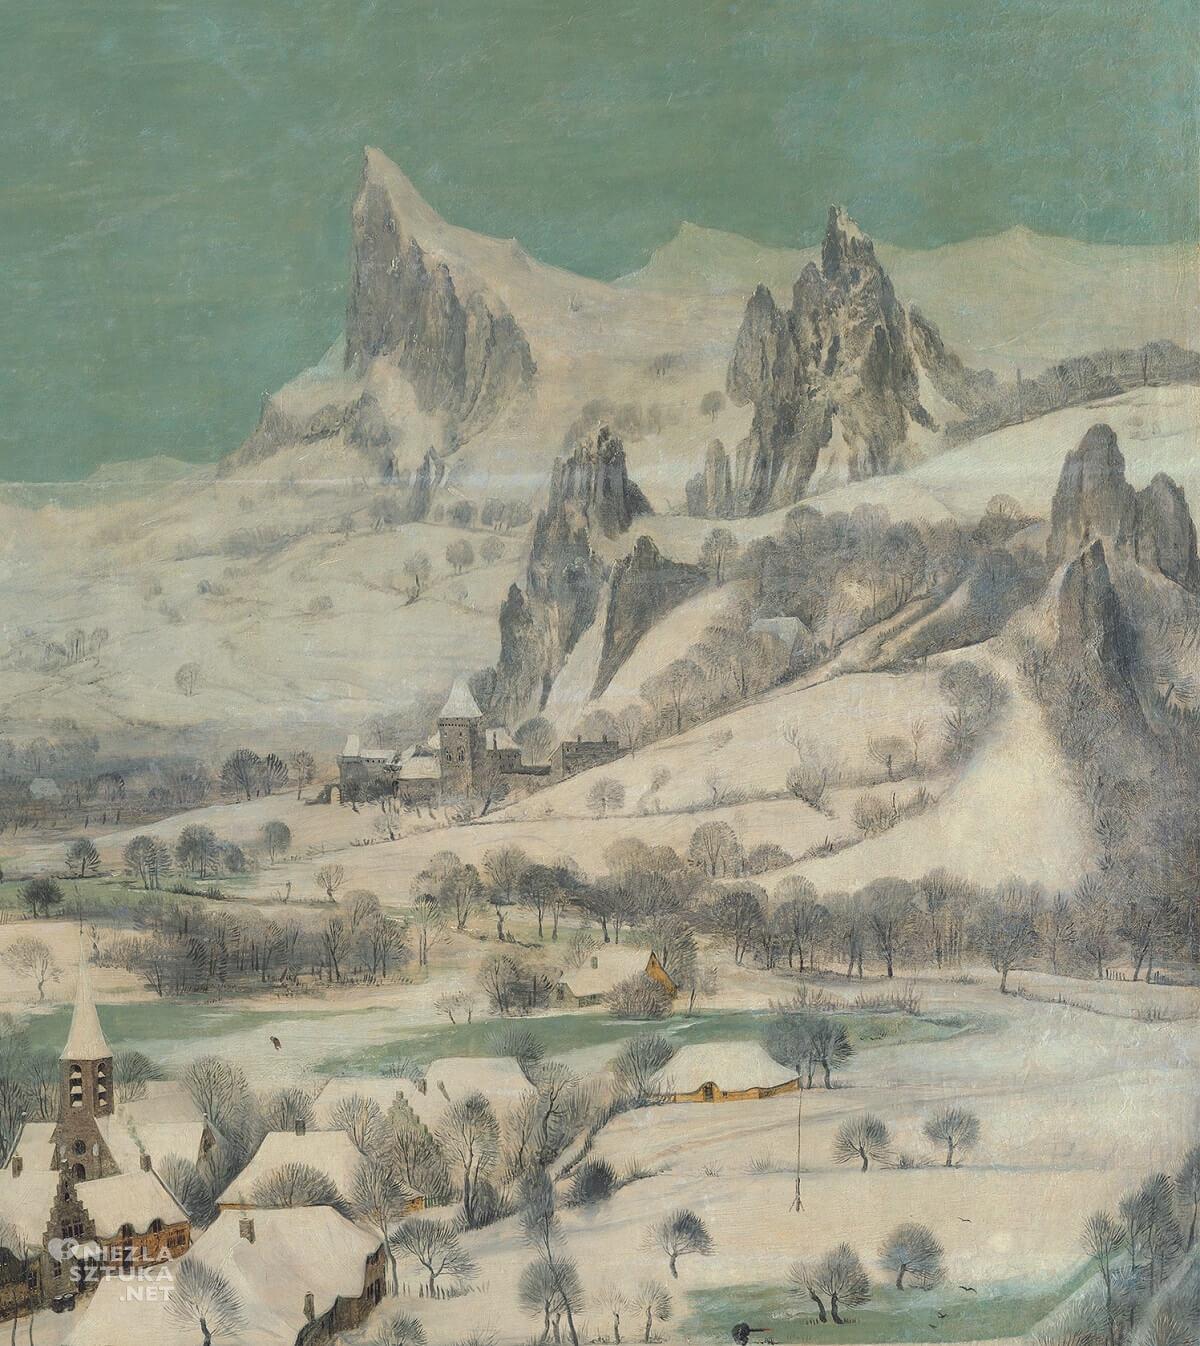 Pieter Bruegel Starszy, Pieter Bruegel, Zima, Myśliwi na śniegu, Niezła sztuka